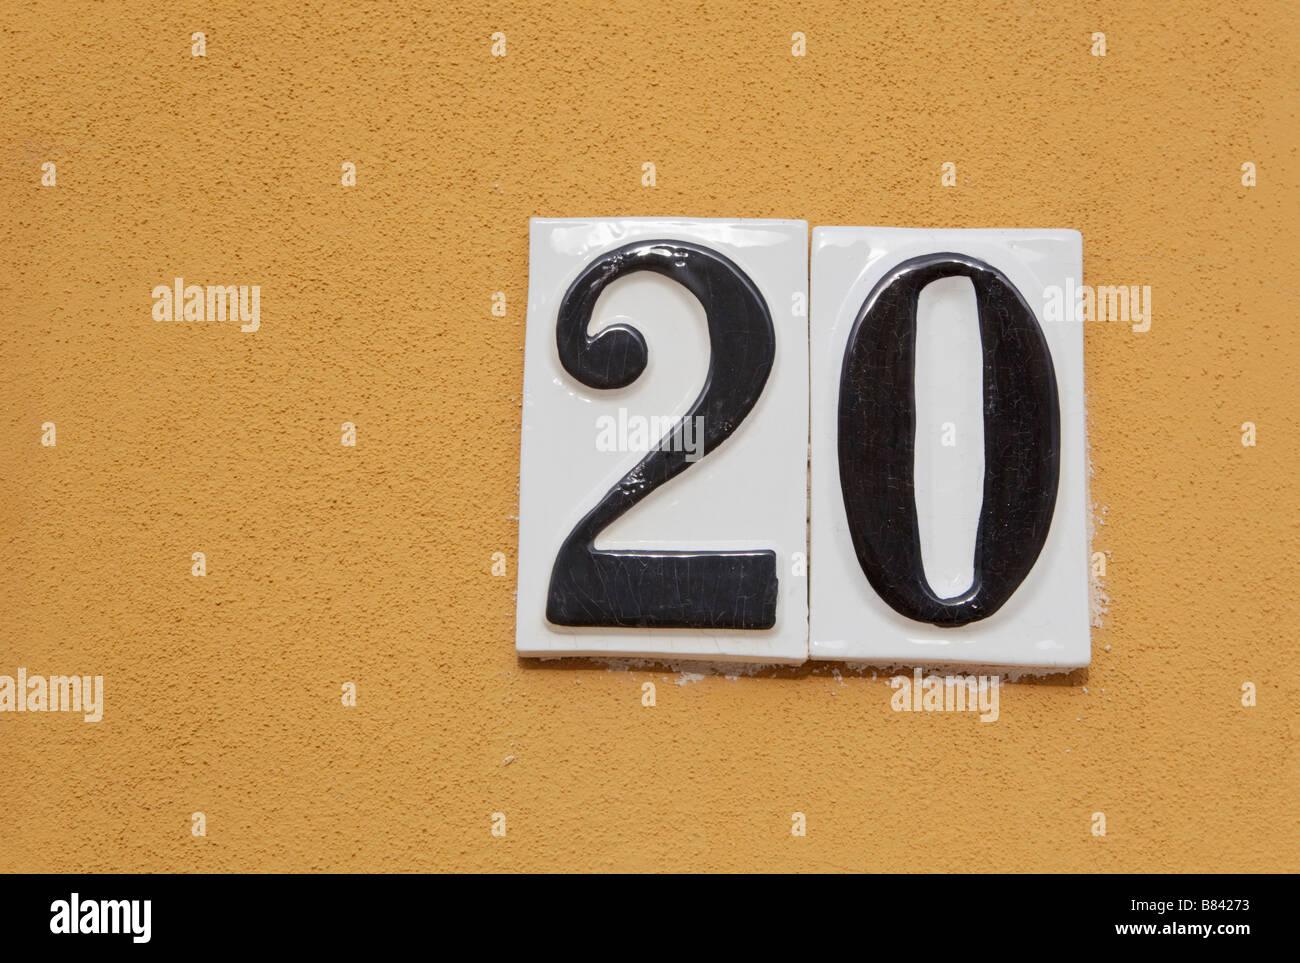 Number Twenty - Stock Image